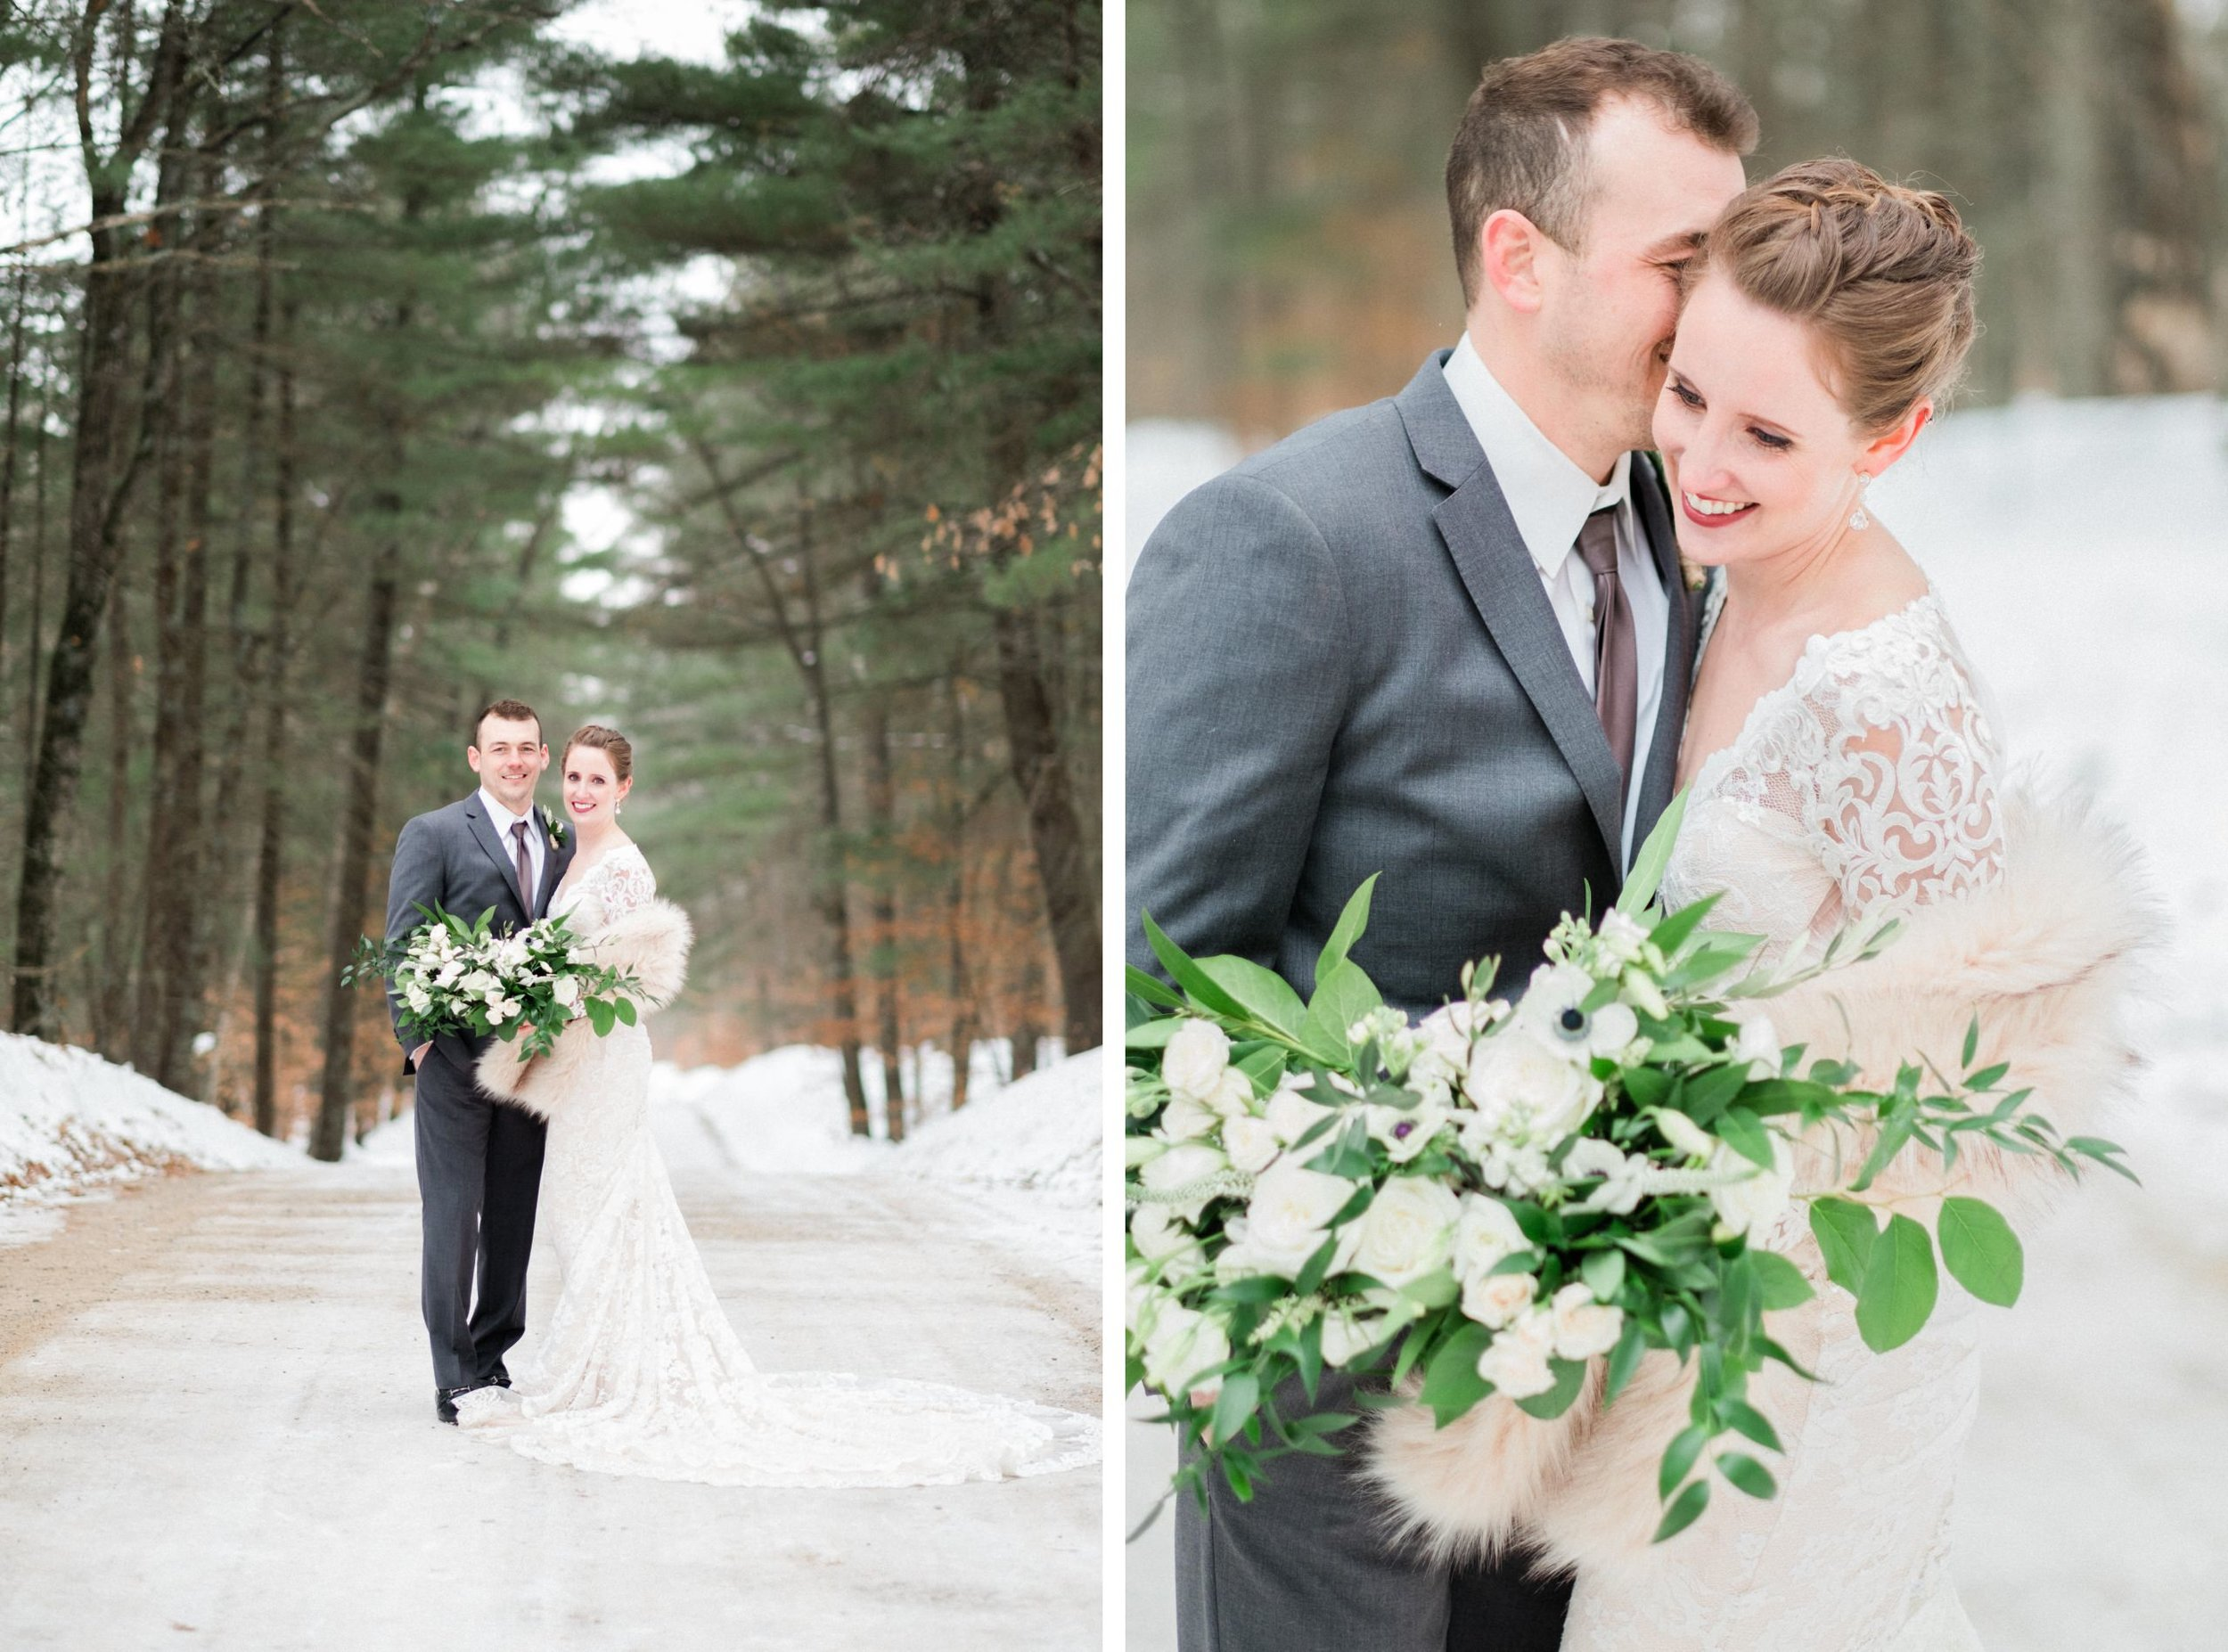 Wedding photography in Northern MN near Brainerd and Crosslake